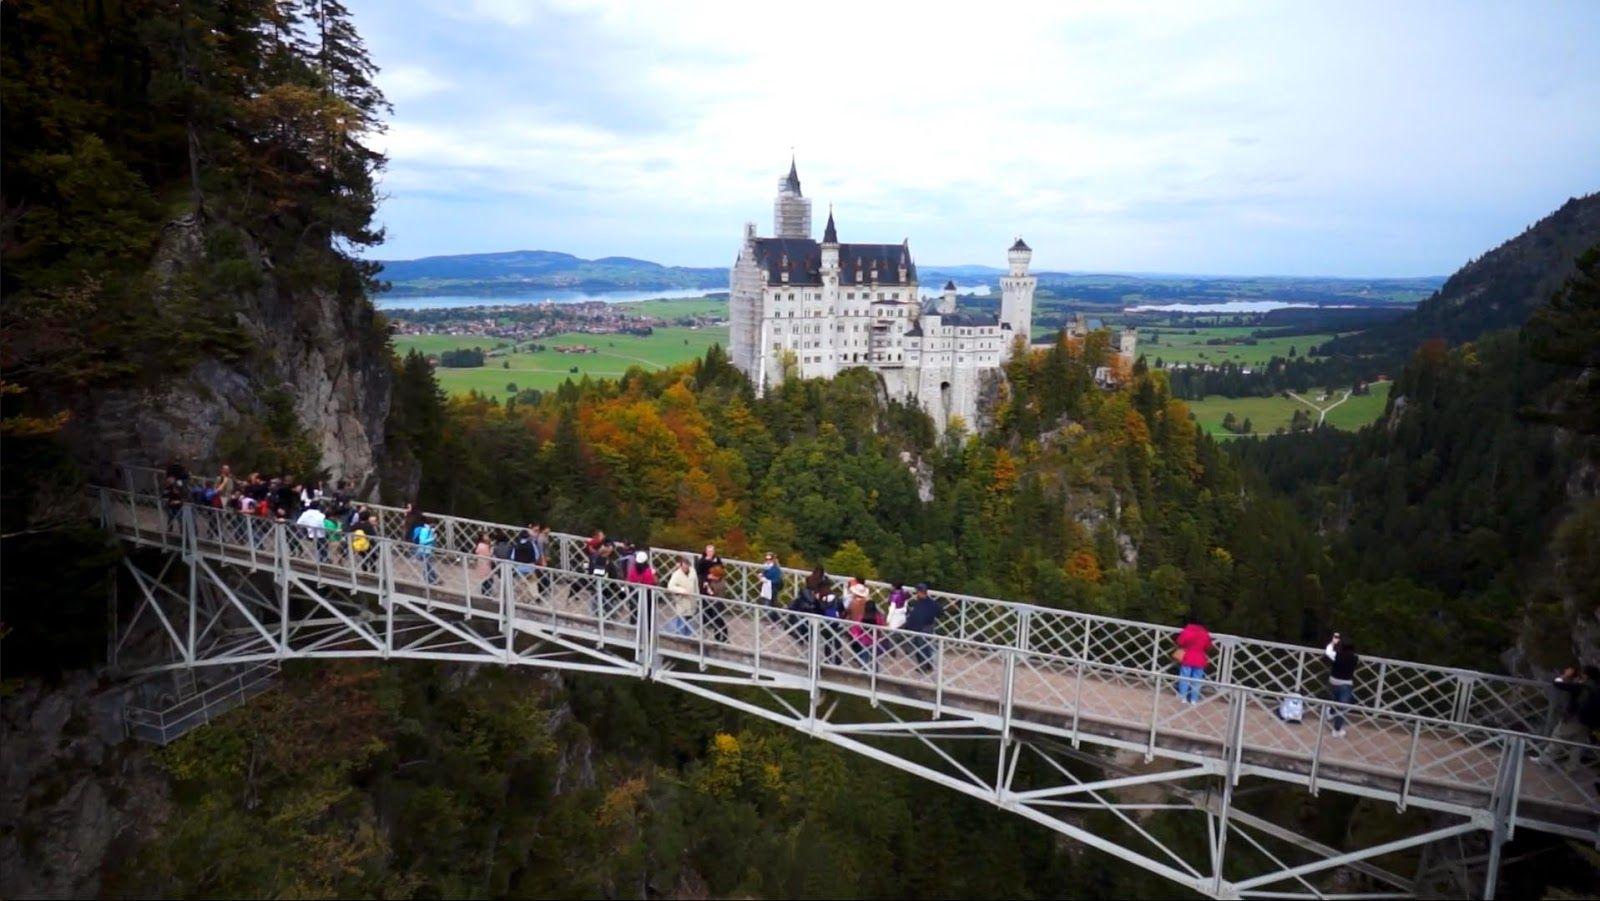 English Marienbrucke Mary S Bridge Is A Bridge Located Near The Famous Neuschwanstein Castle In Hohenschw Neuschwanstein Castle Germany Castles Scary Bridges